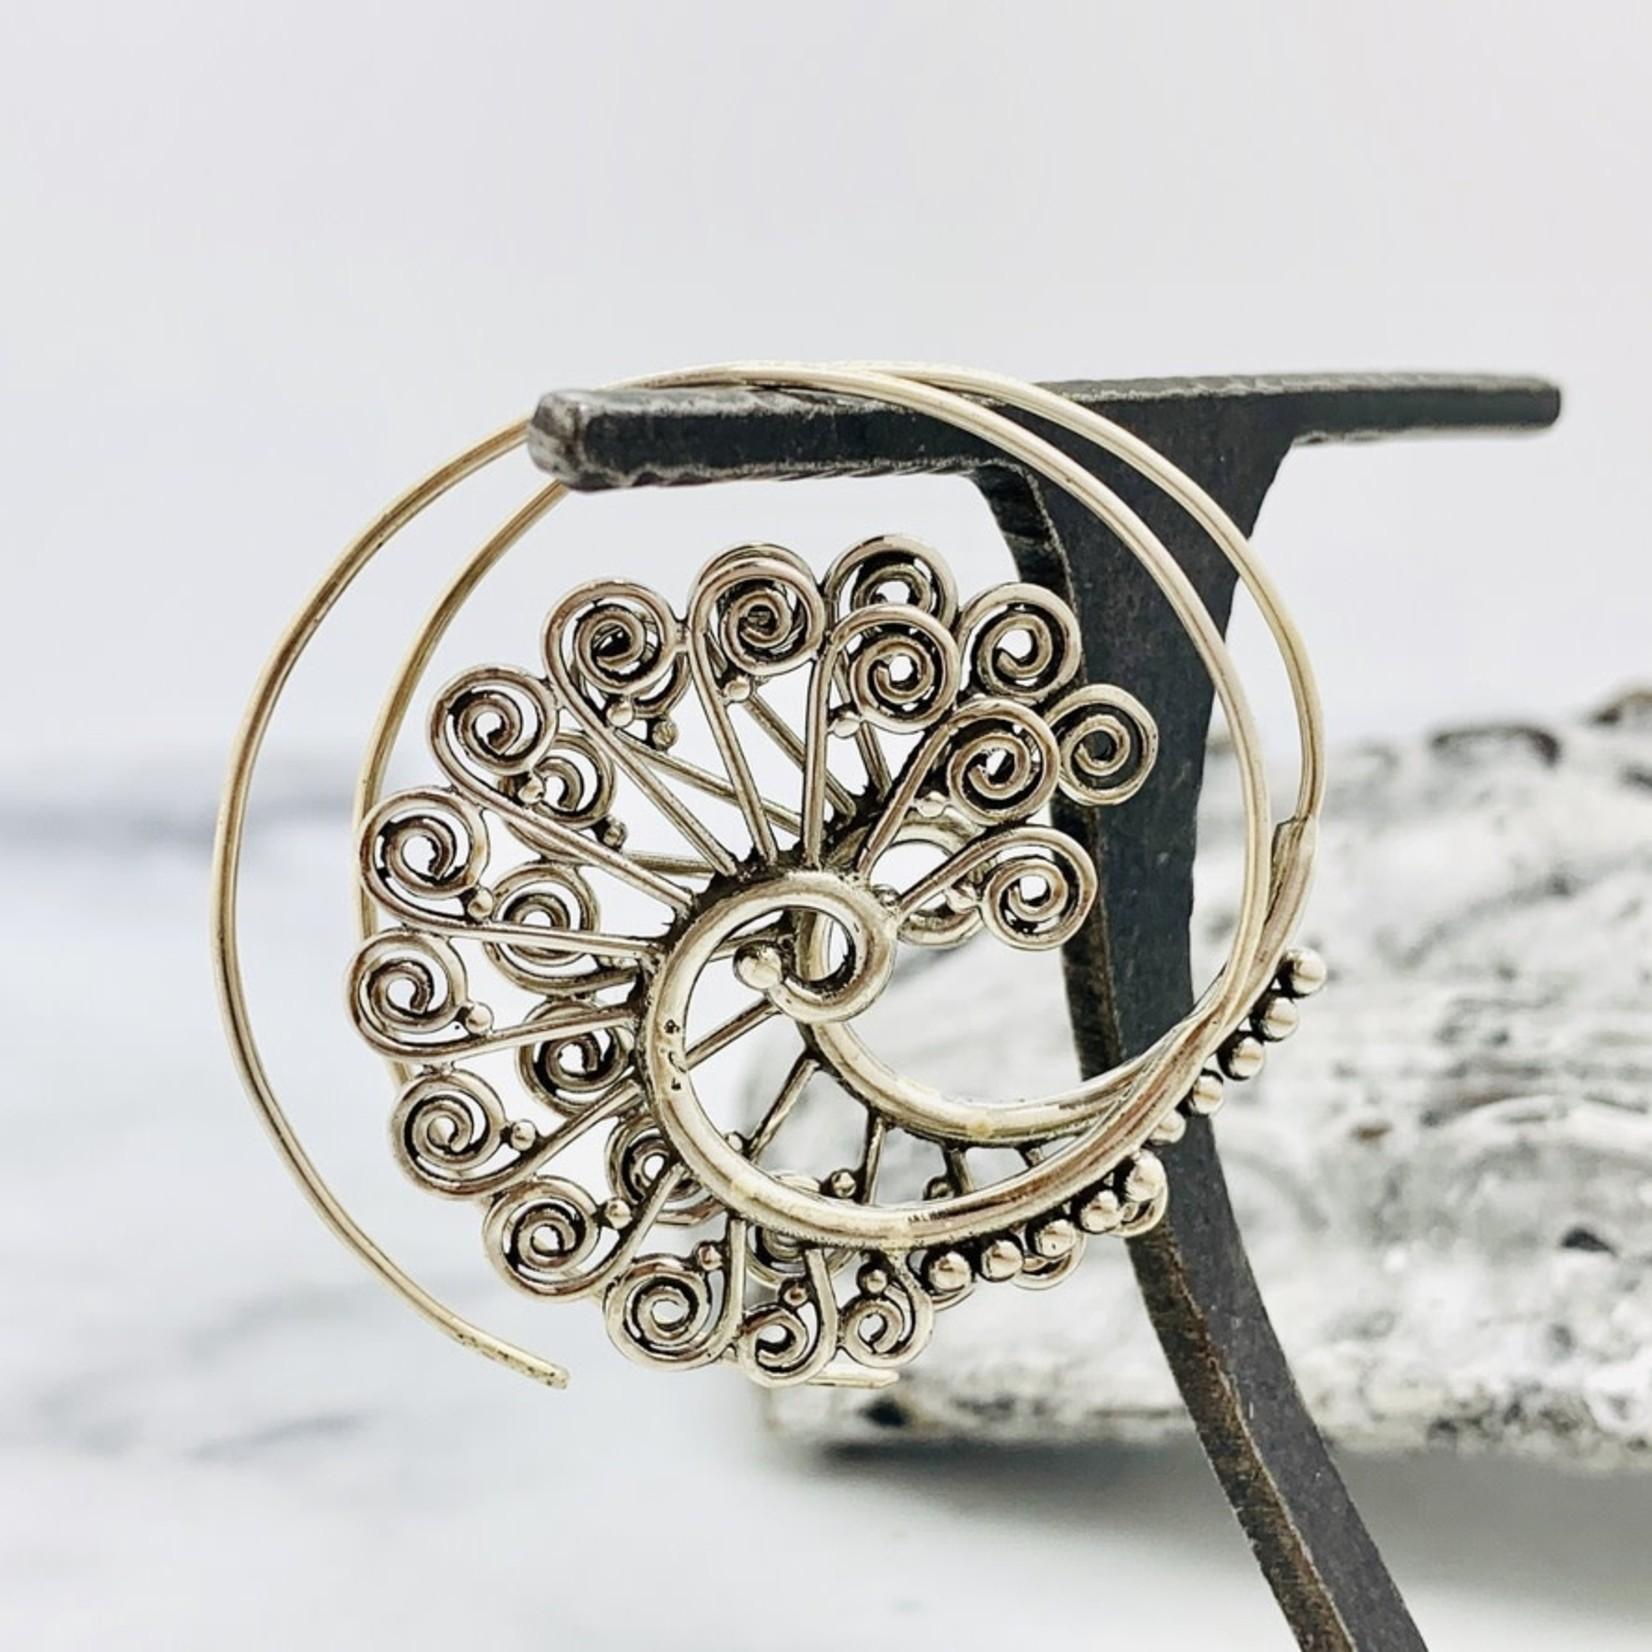 Baizaar Sterling silver warrior spiral earrings